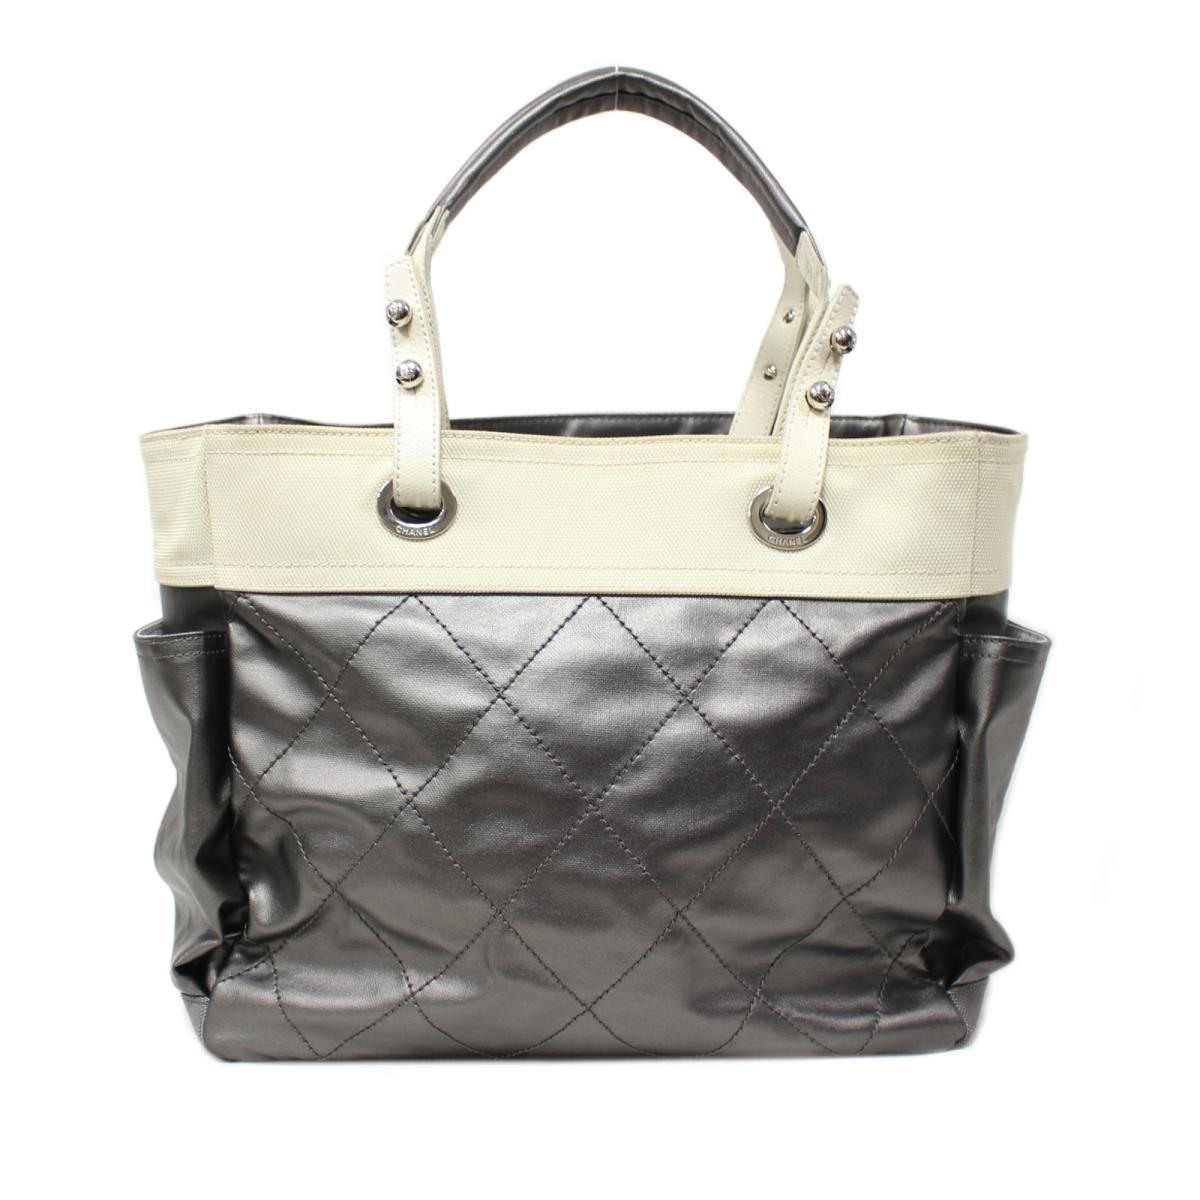 ee3ba6f401a5 BRANDOFF: Auth CHANEL Paris Biarritz Tote Bag PVC x canvas x leather Silver  Used | BRANDOFF Ginza/TOKYO/Japan | Rakuten Global Market